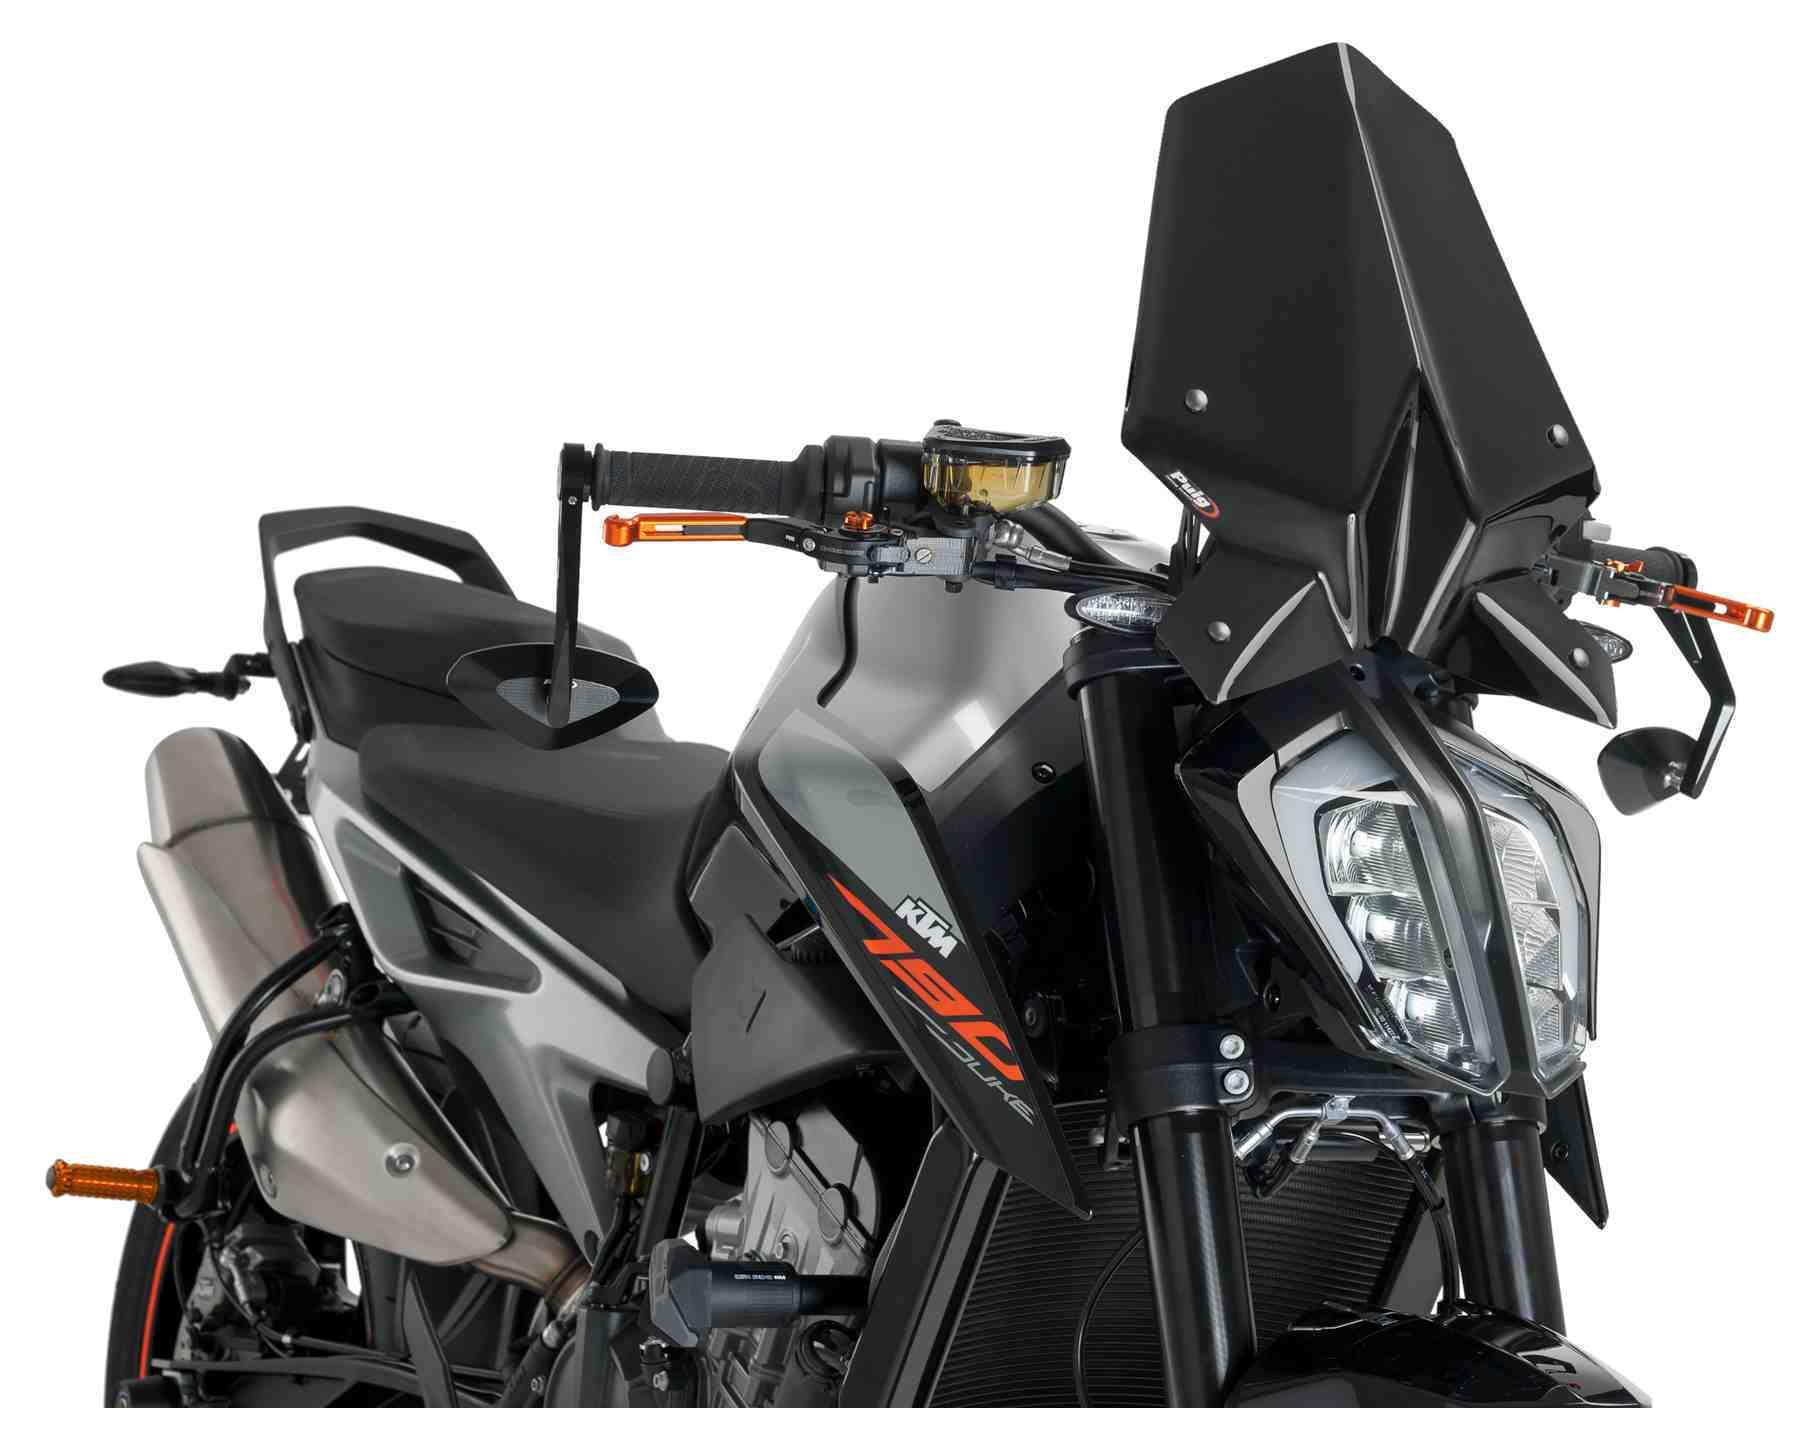 Youth Dirt Bike Boots >> Puig Naked New Generation Windscreen KTM 790 Duke 2018 ...